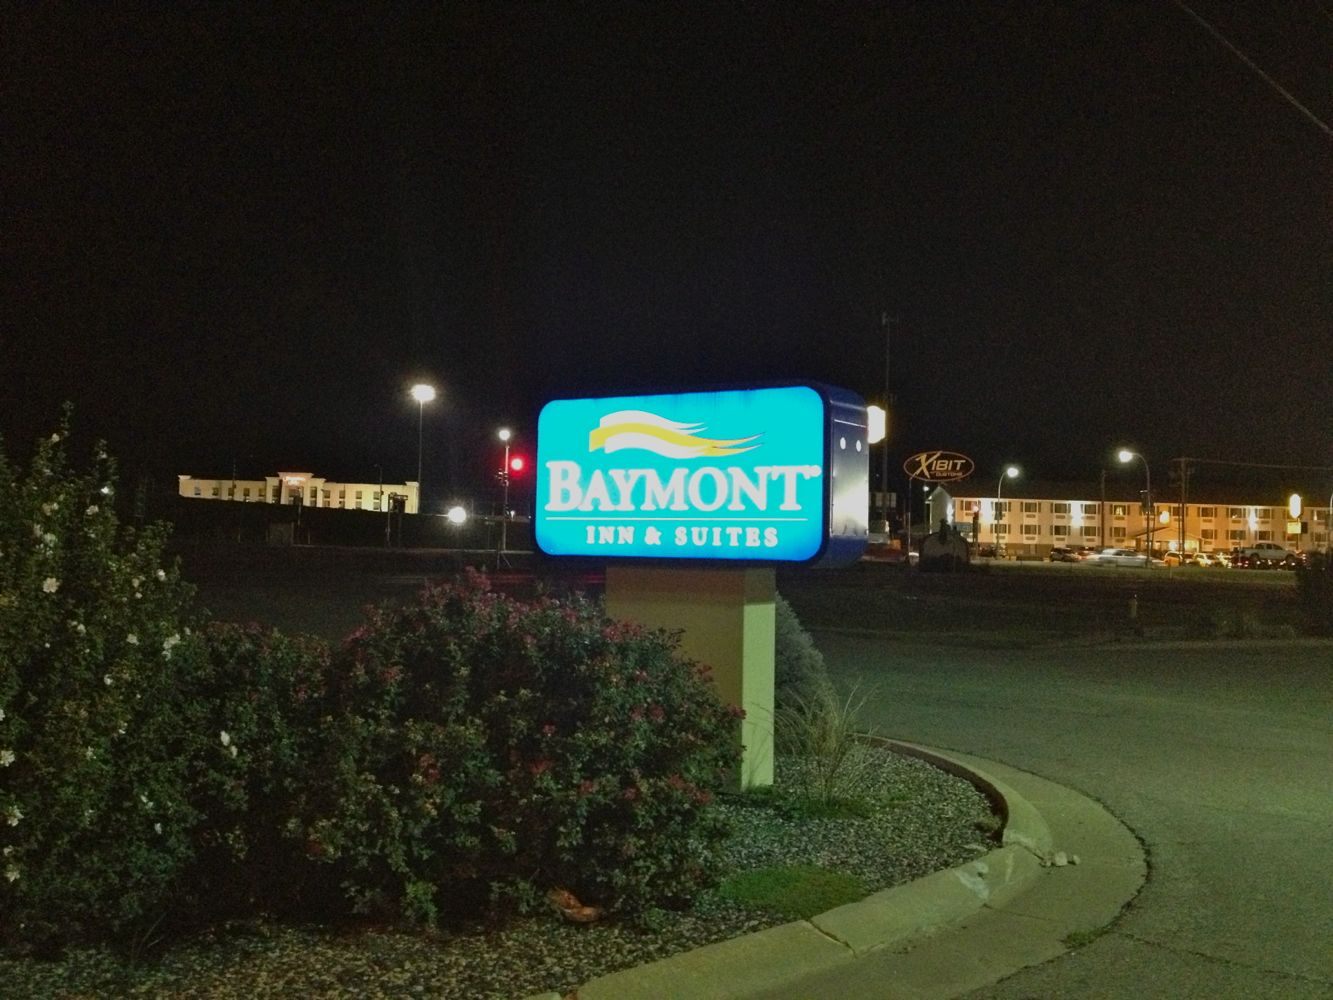 BaymontSignBaja